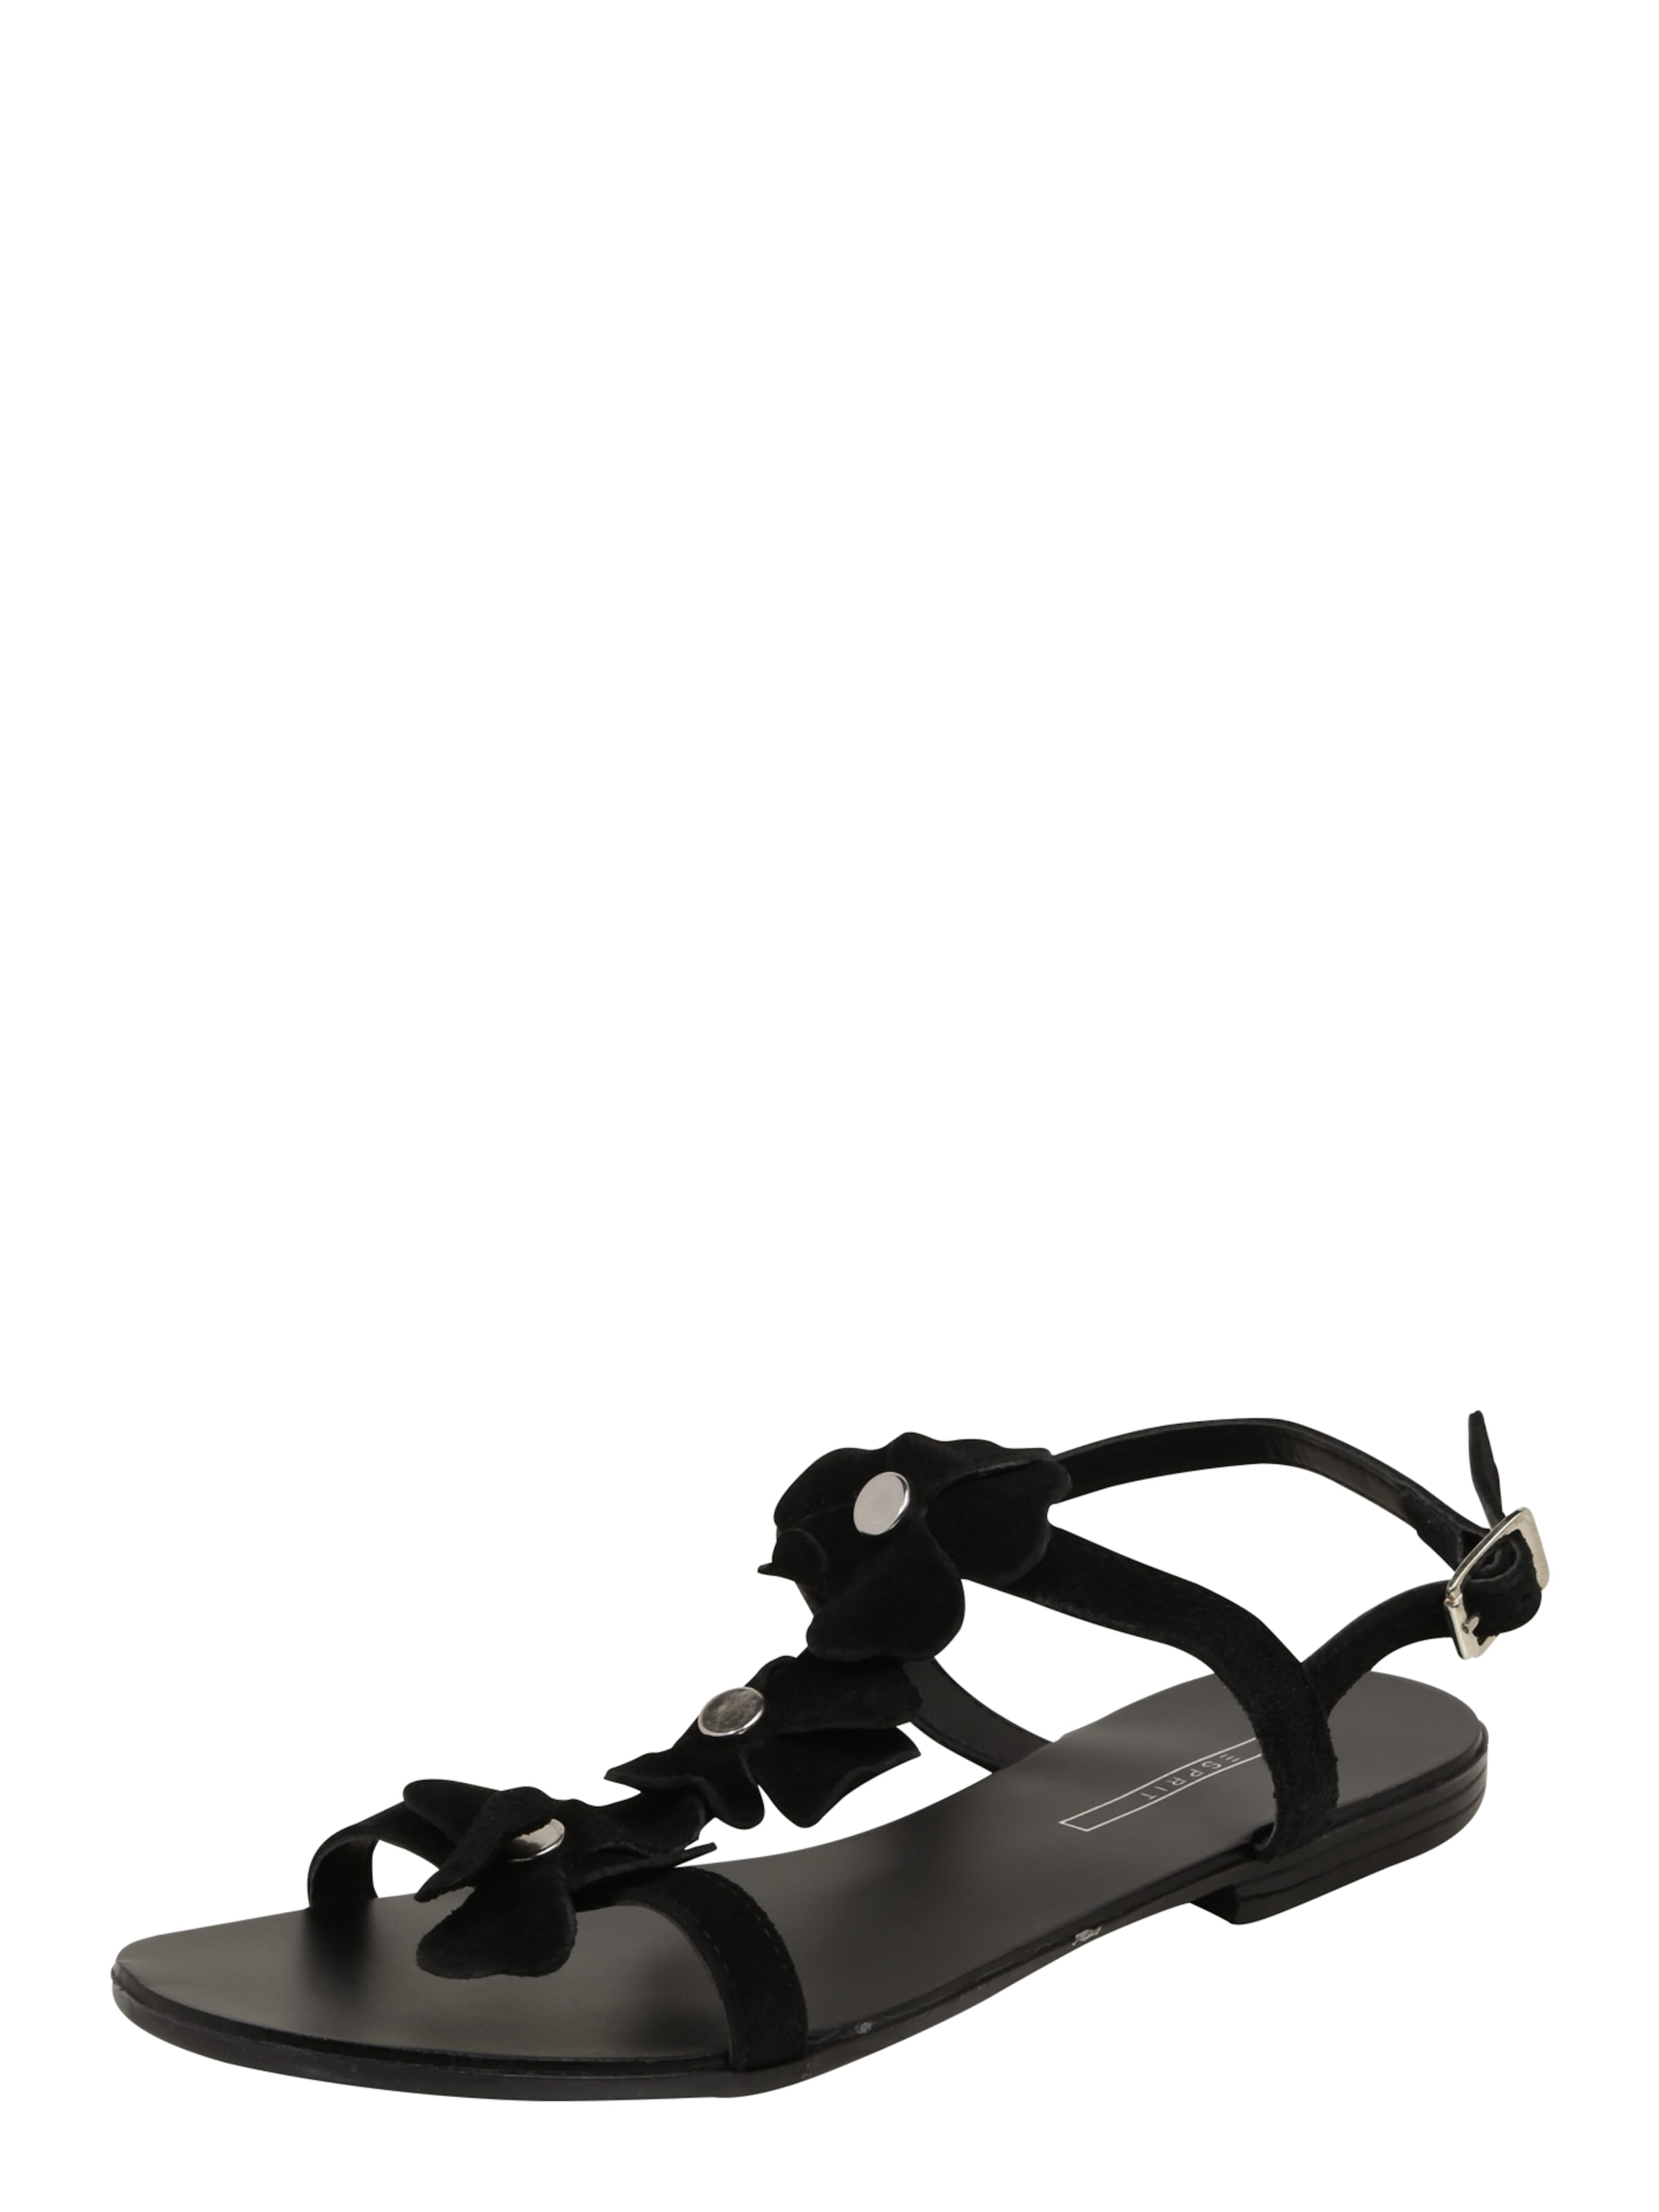 Haltbare Mode billige Schuhe ESPRIT | Sandale 'Helsy' Schuhe Gut getragene Schuhe